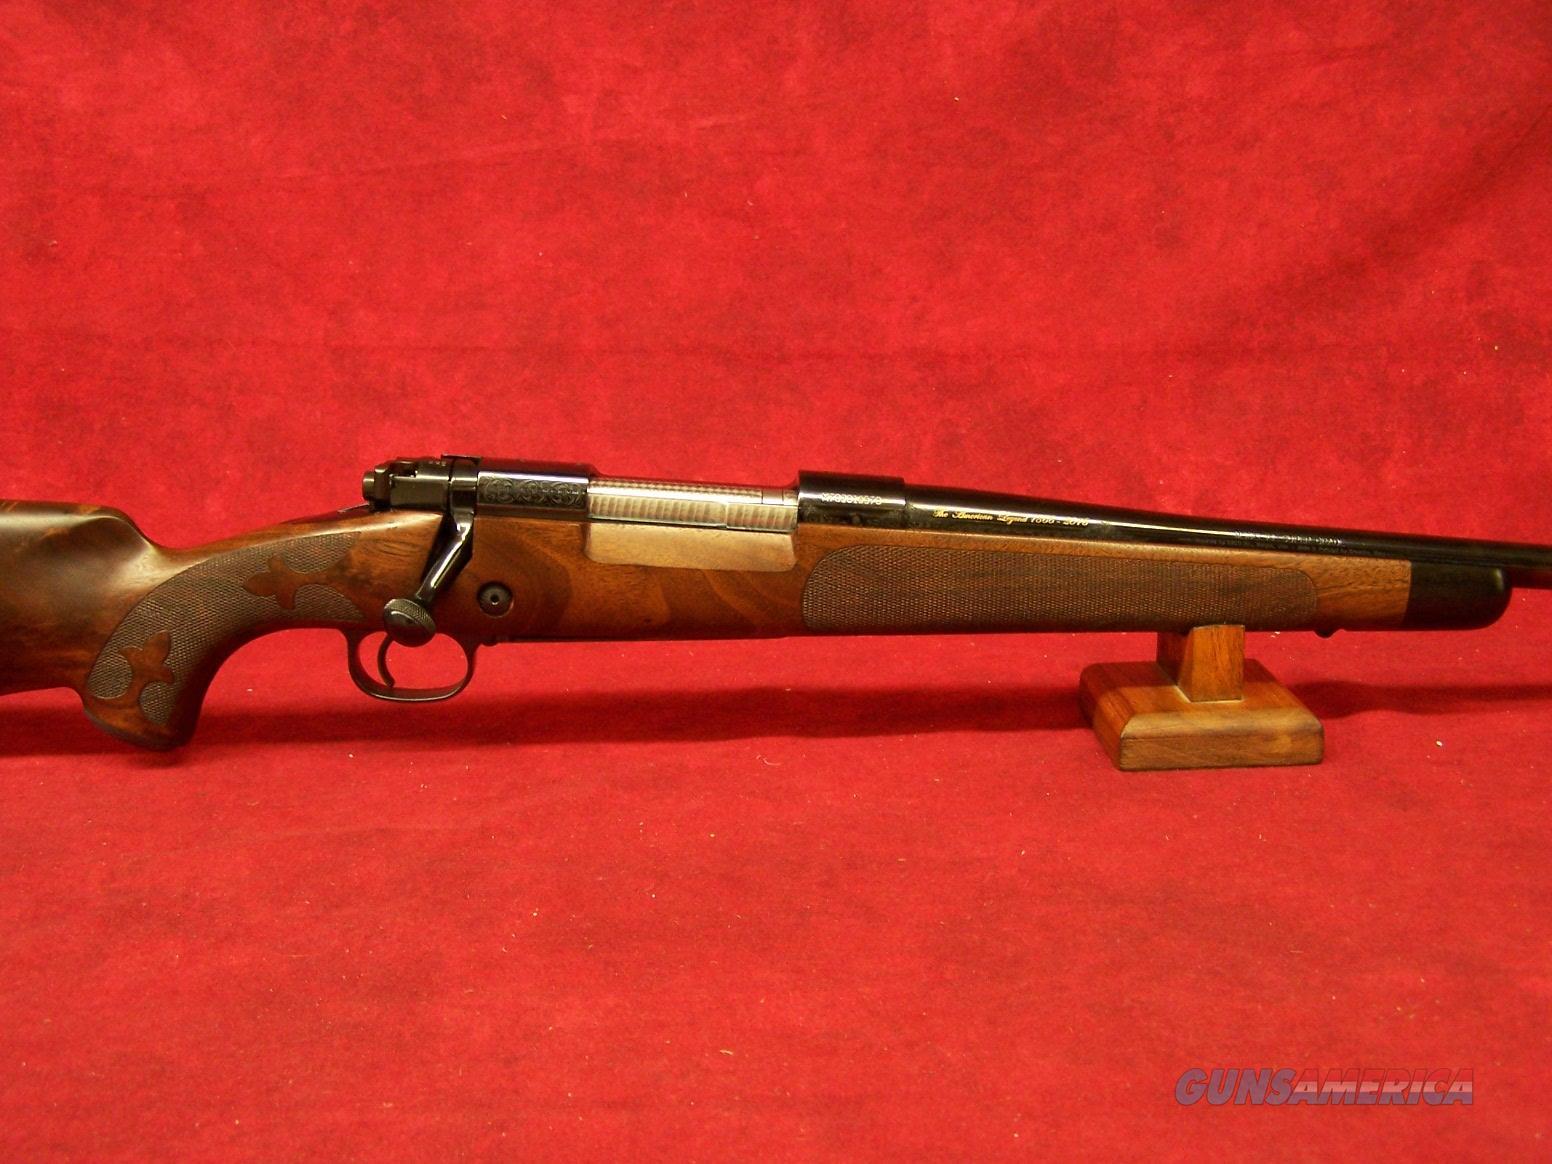 Winchester Model 70 150th Commemorative Rifle .270 Winchester 24 Inch High Polish Sporter Profile Barrel American Walnut Stock (535221226)  Guns > Rifles > Winchester Rifles - Modern Bolt/Auto/Single > Model 70 > Post-64